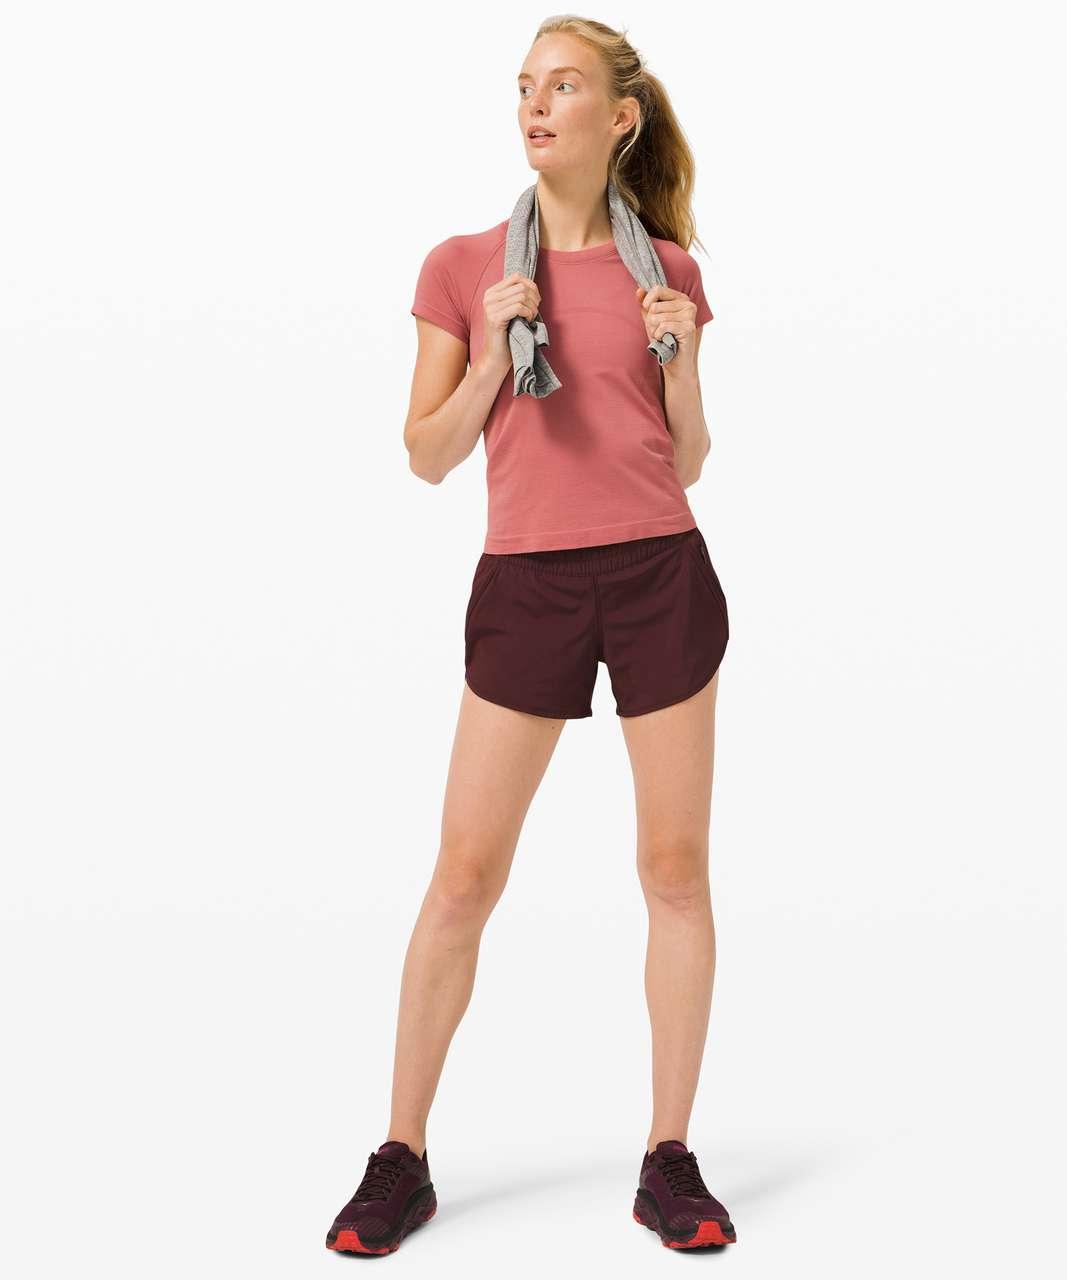 Lululemon Swiftly Tech Short Sleeve 2.0 *Race - Cherry Tint / Cherry Tint